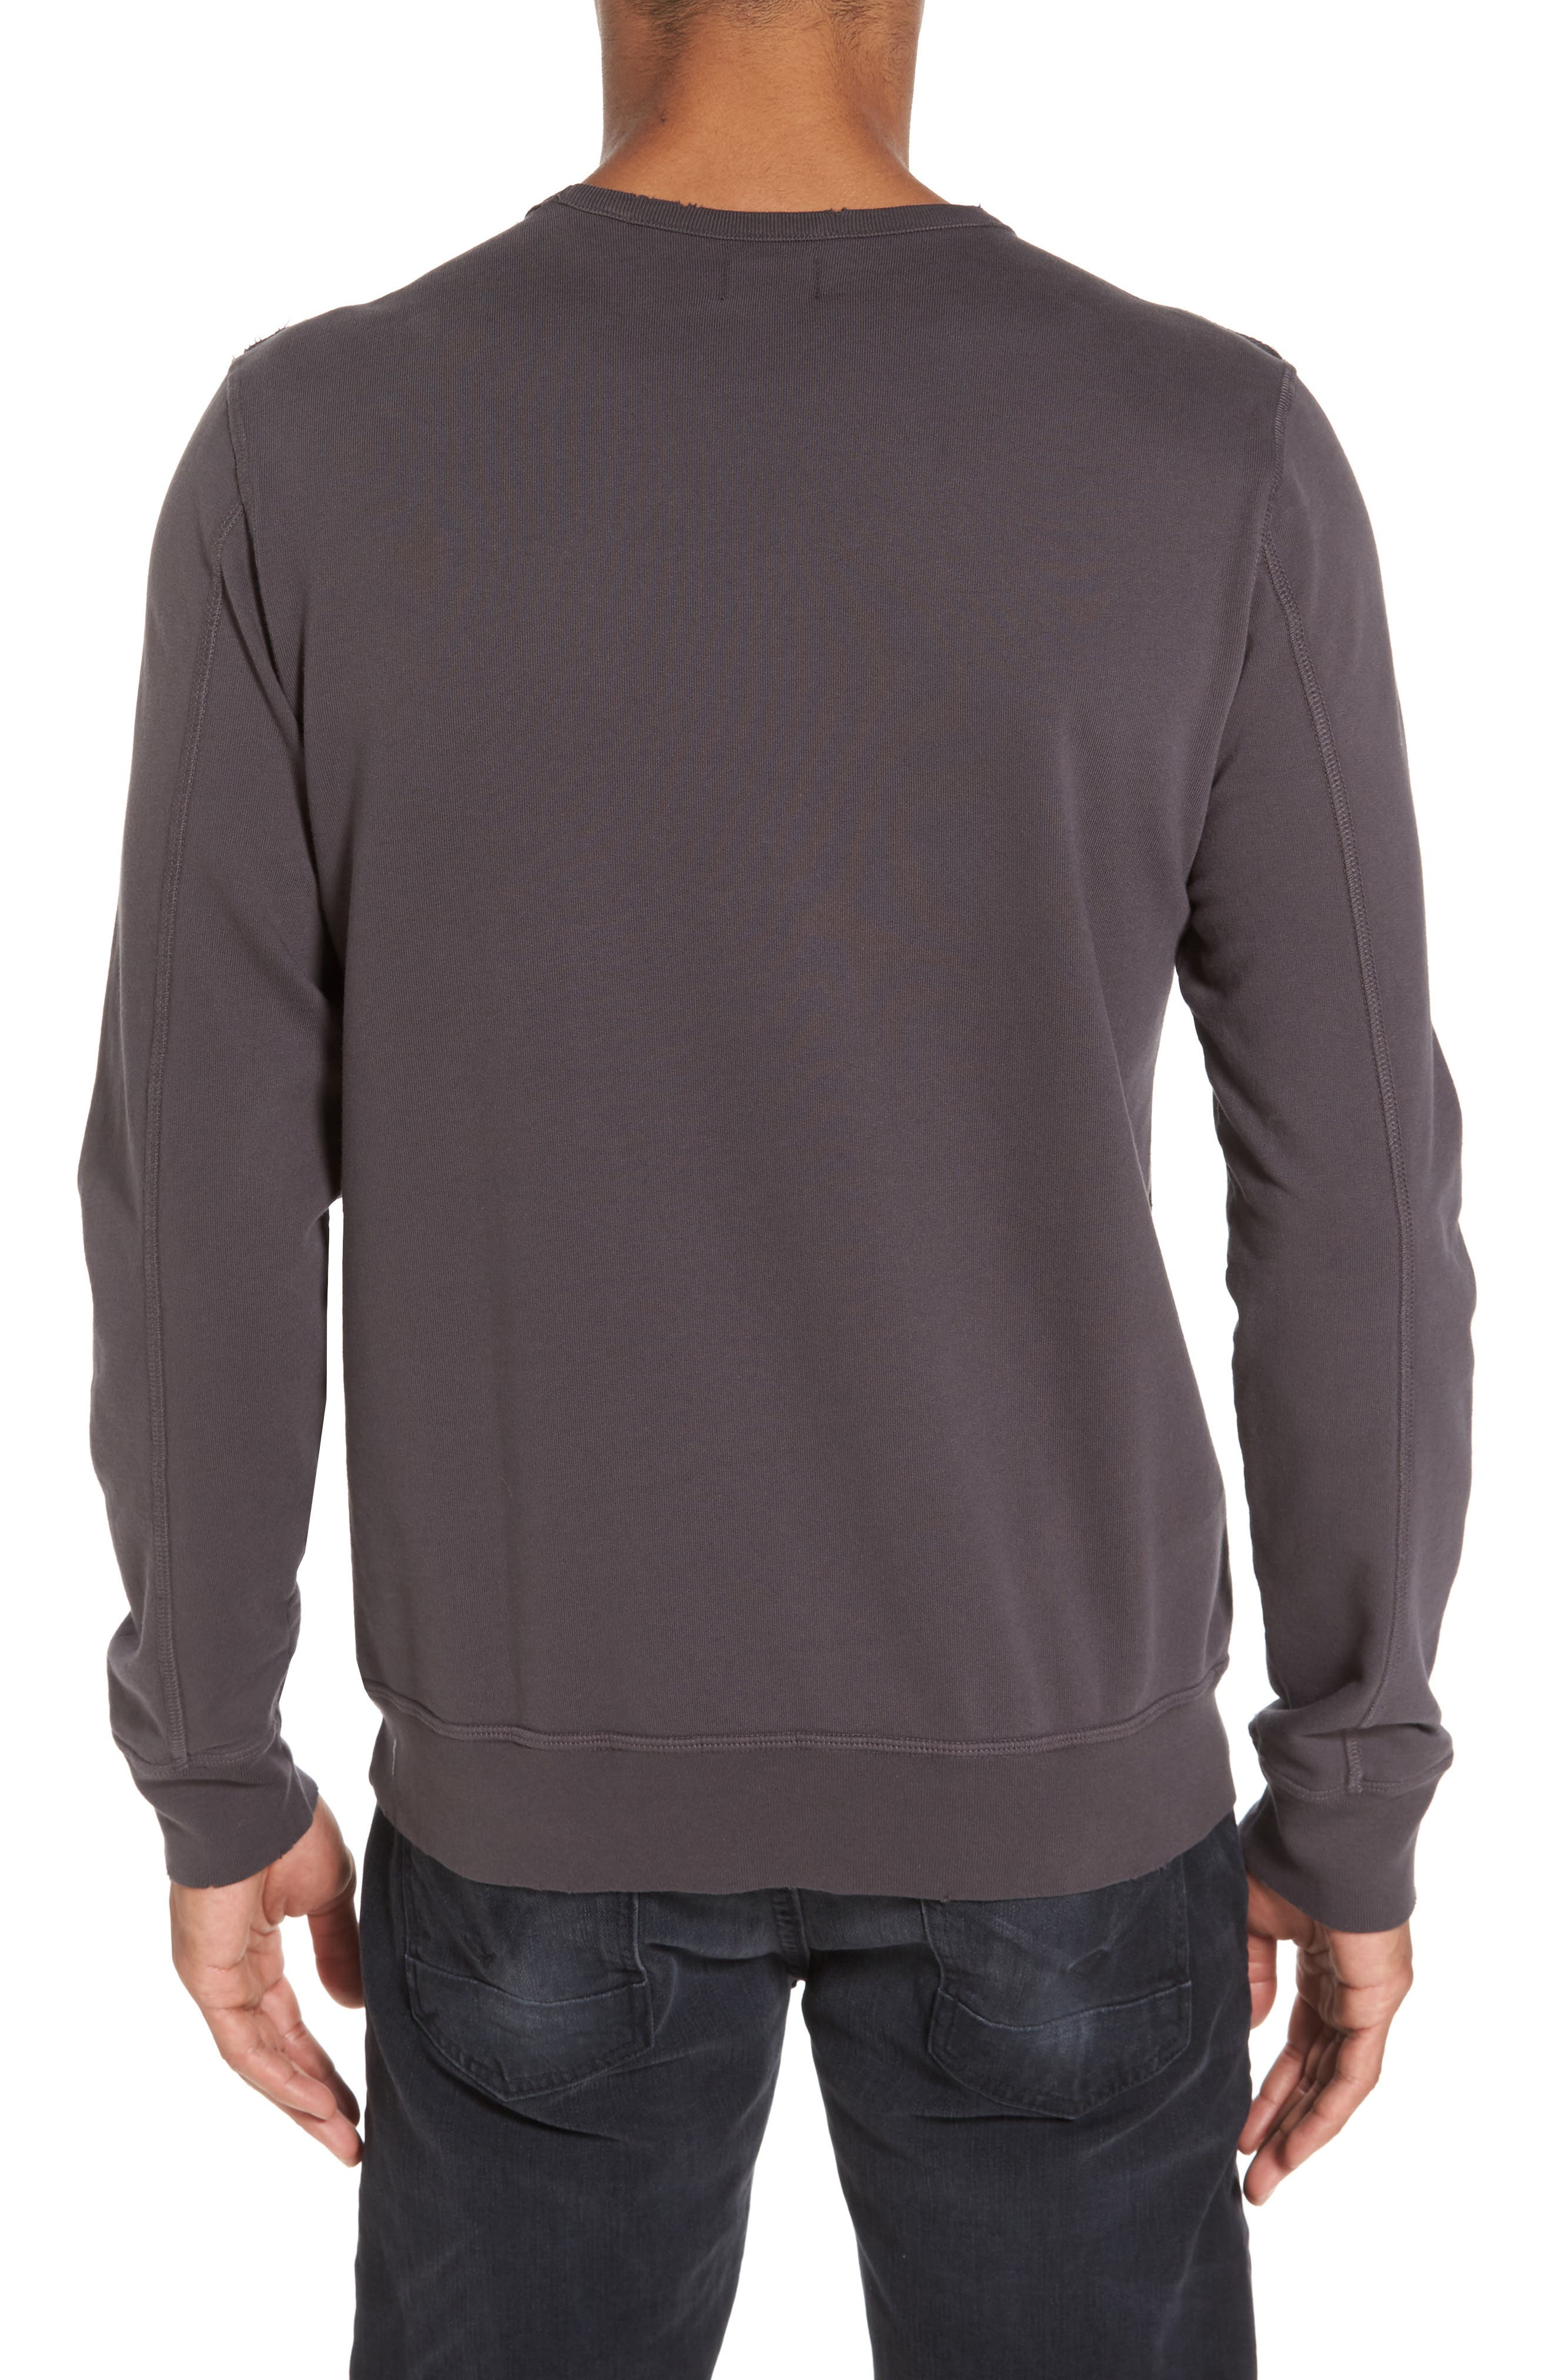 Tyson Slim Fit Sweatshirt,                             Alternate thumbnail 2, color,                             022